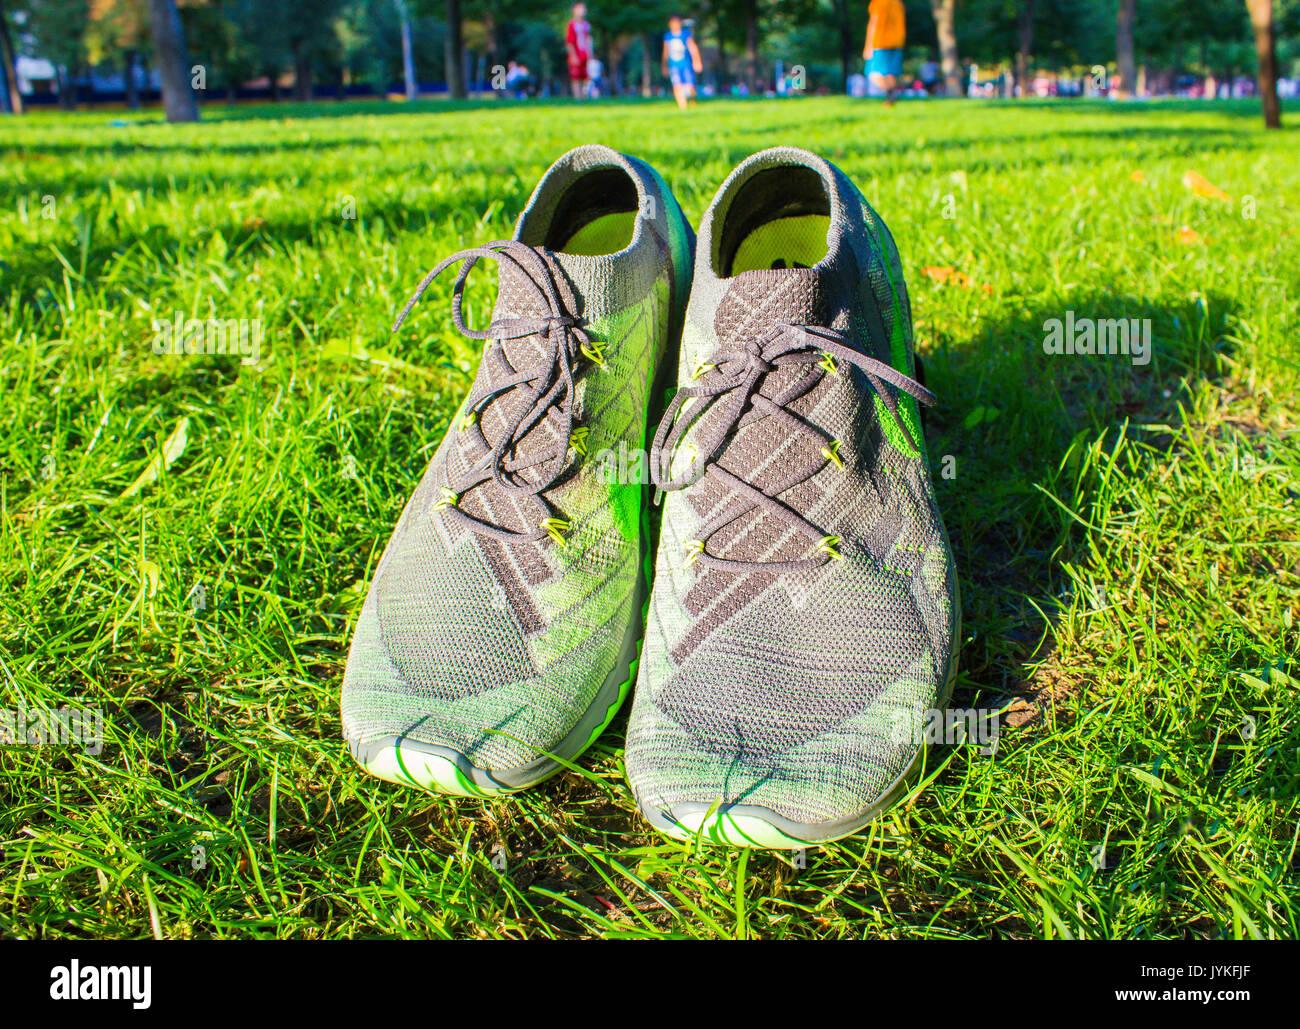 Dnipropetrowsk, Ukraine - August, 21 2016: Neuer Stil nike schuhe auf grünem Gras - illustrative Editorial Stockbild